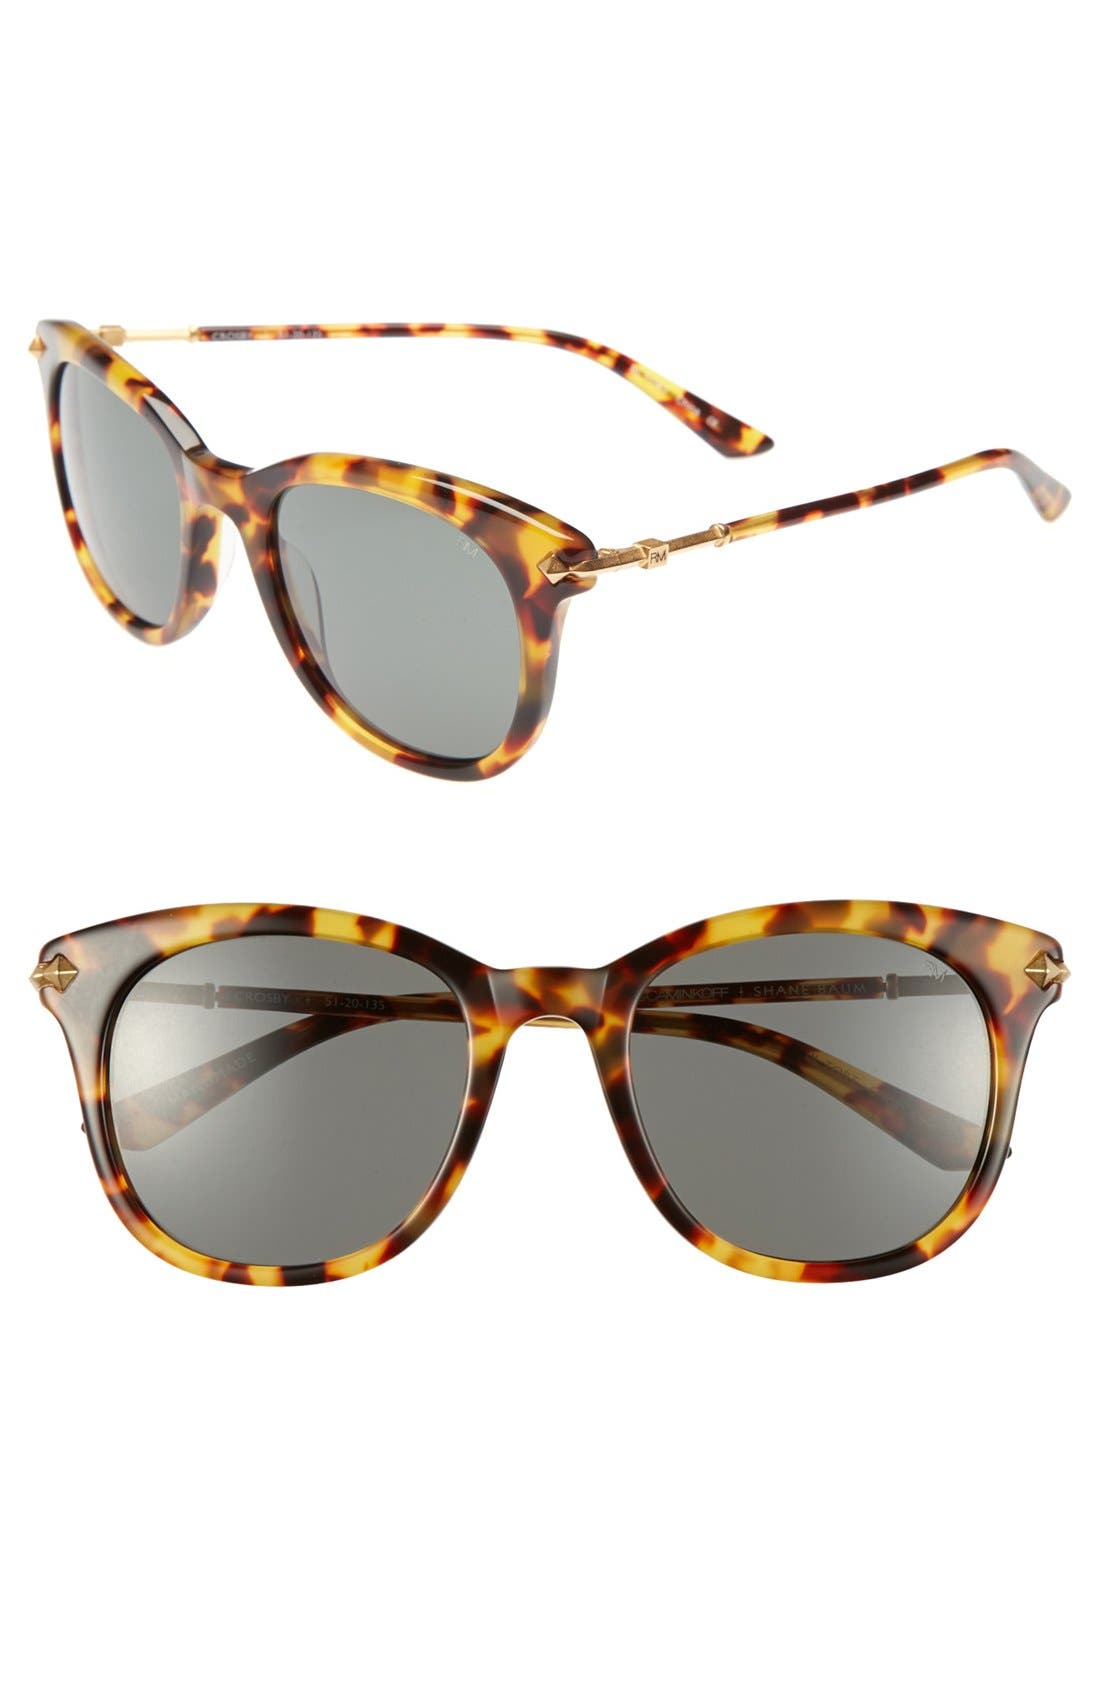 Main Image - Rebecca Minkoff 'Crosby' 51mm Sunglasses